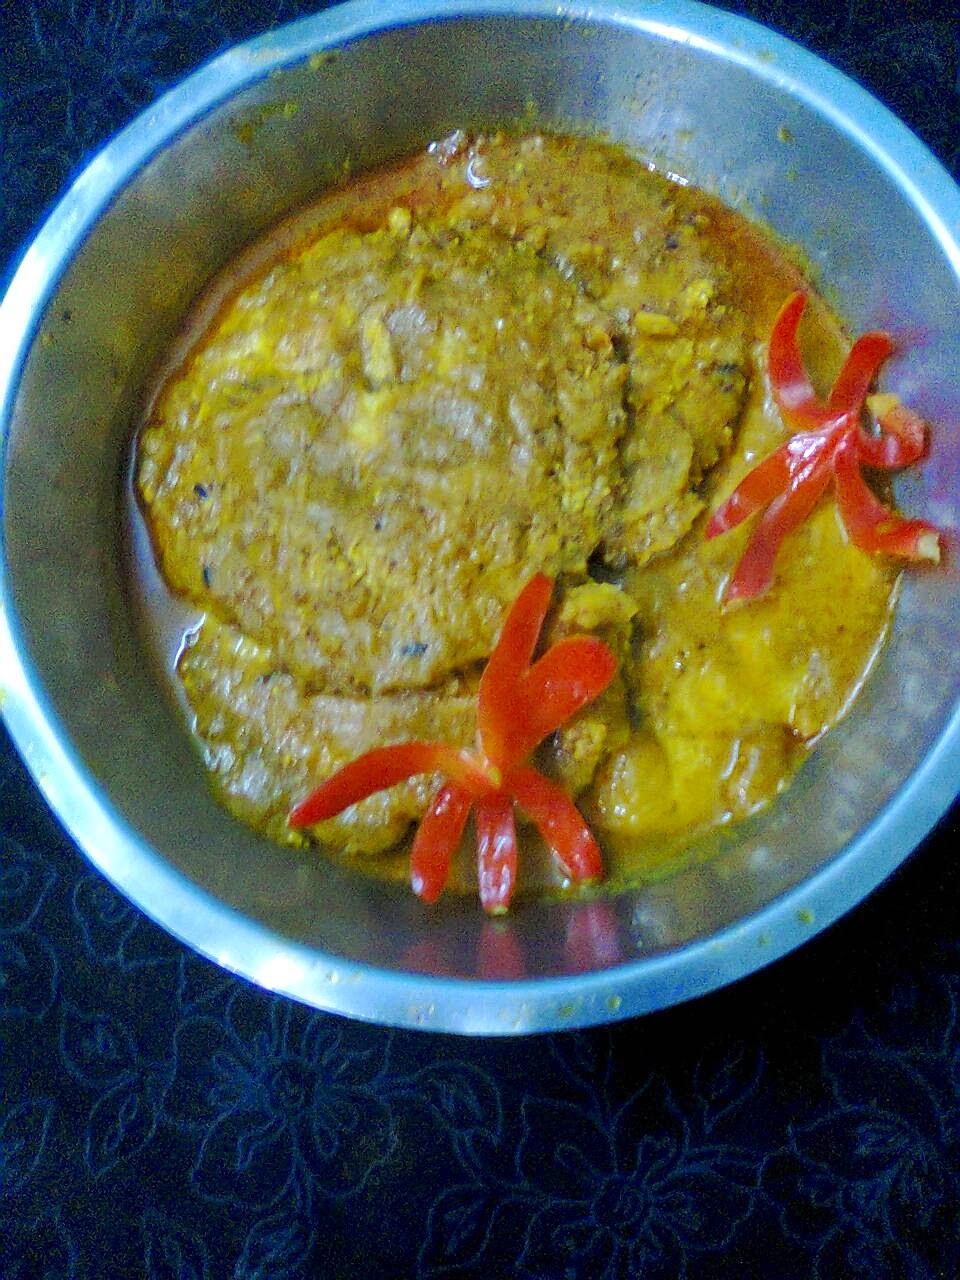 Fish Egg (Roe) Curry / Fish Egg - 252.3KB